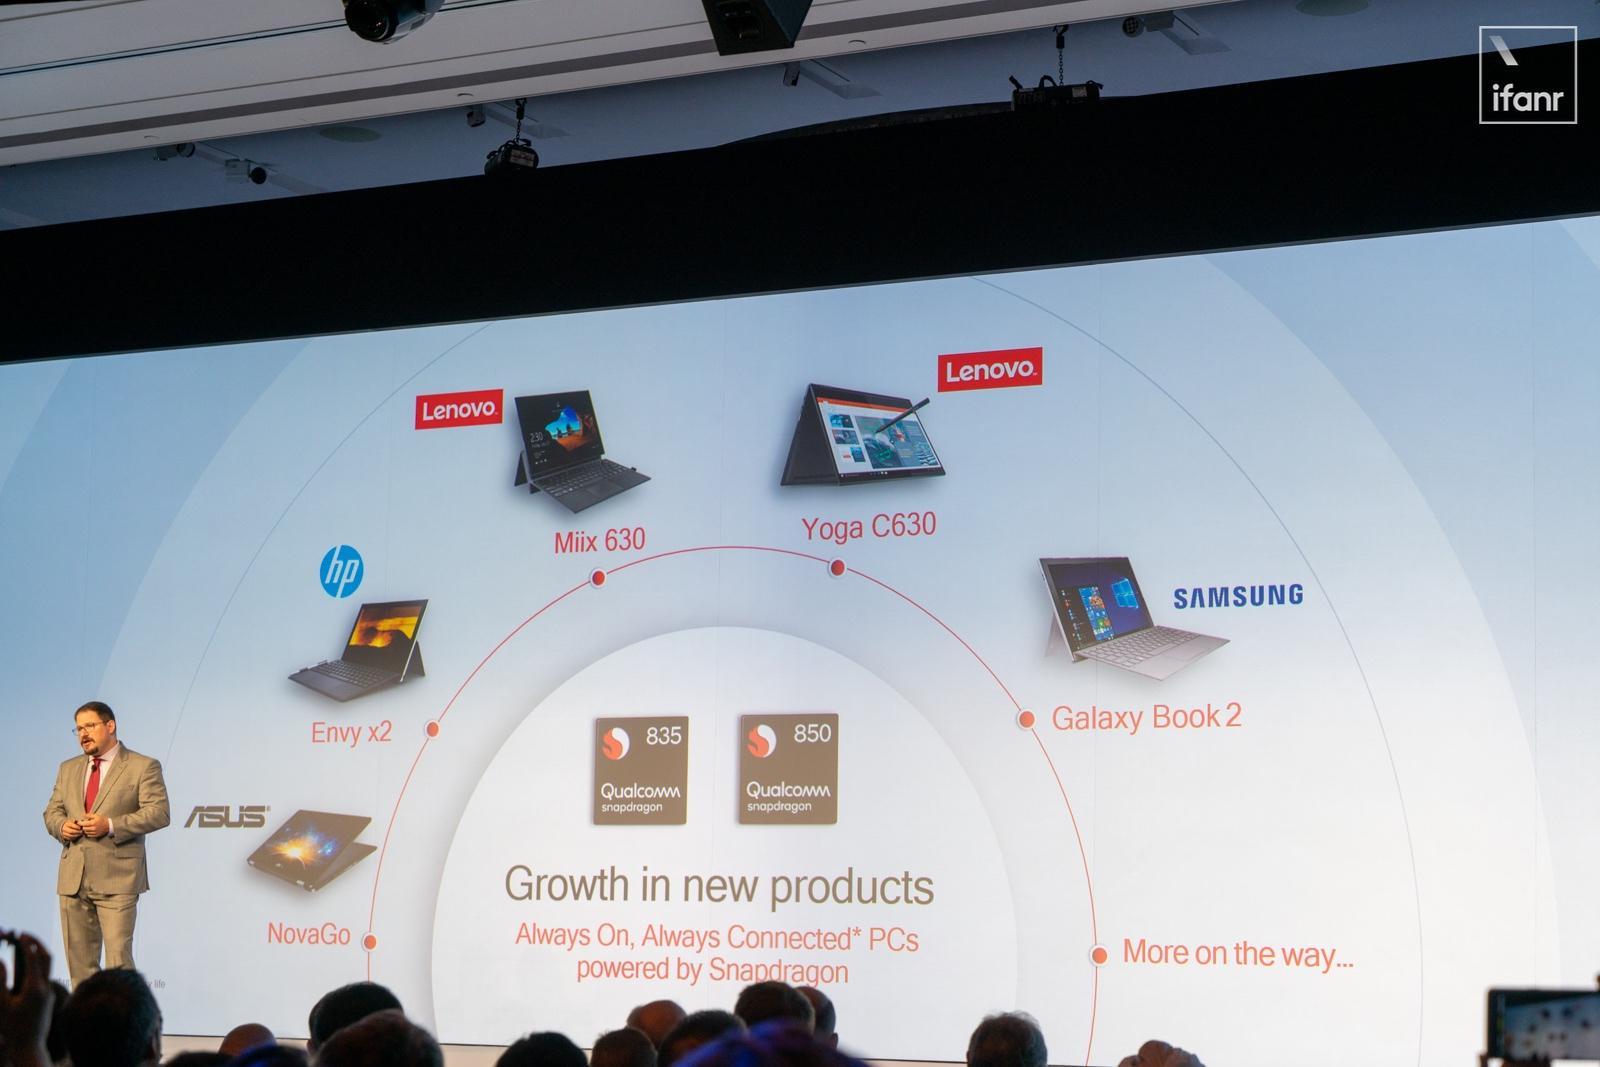 5G 时代的高通,想要覆盖 1000 亿美元的广阔市场  移动互联  第5张